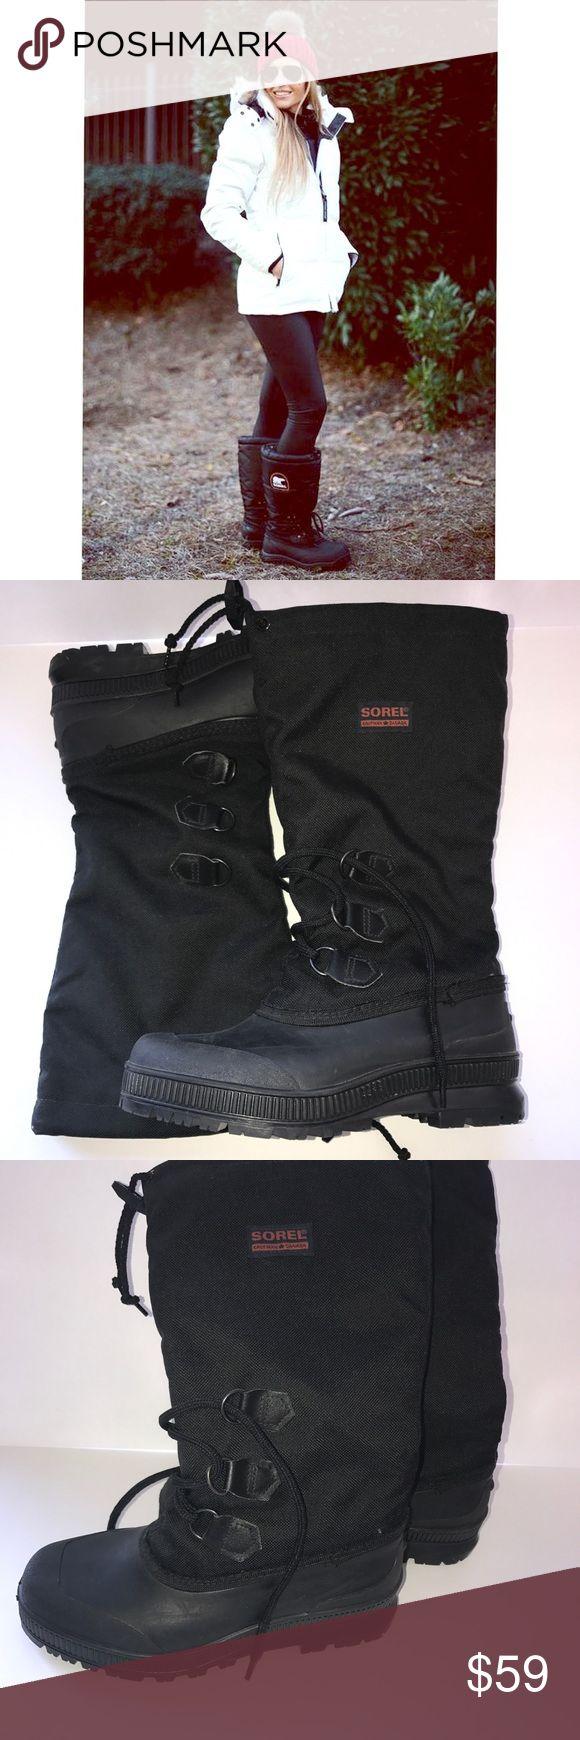 Sorel Snowlion BootsBlack Size 9 NWOT Water proof, weatherproof, heavy rubber tread, lace up with drawstring leg Sorel Shoes Winter & Rain Boots